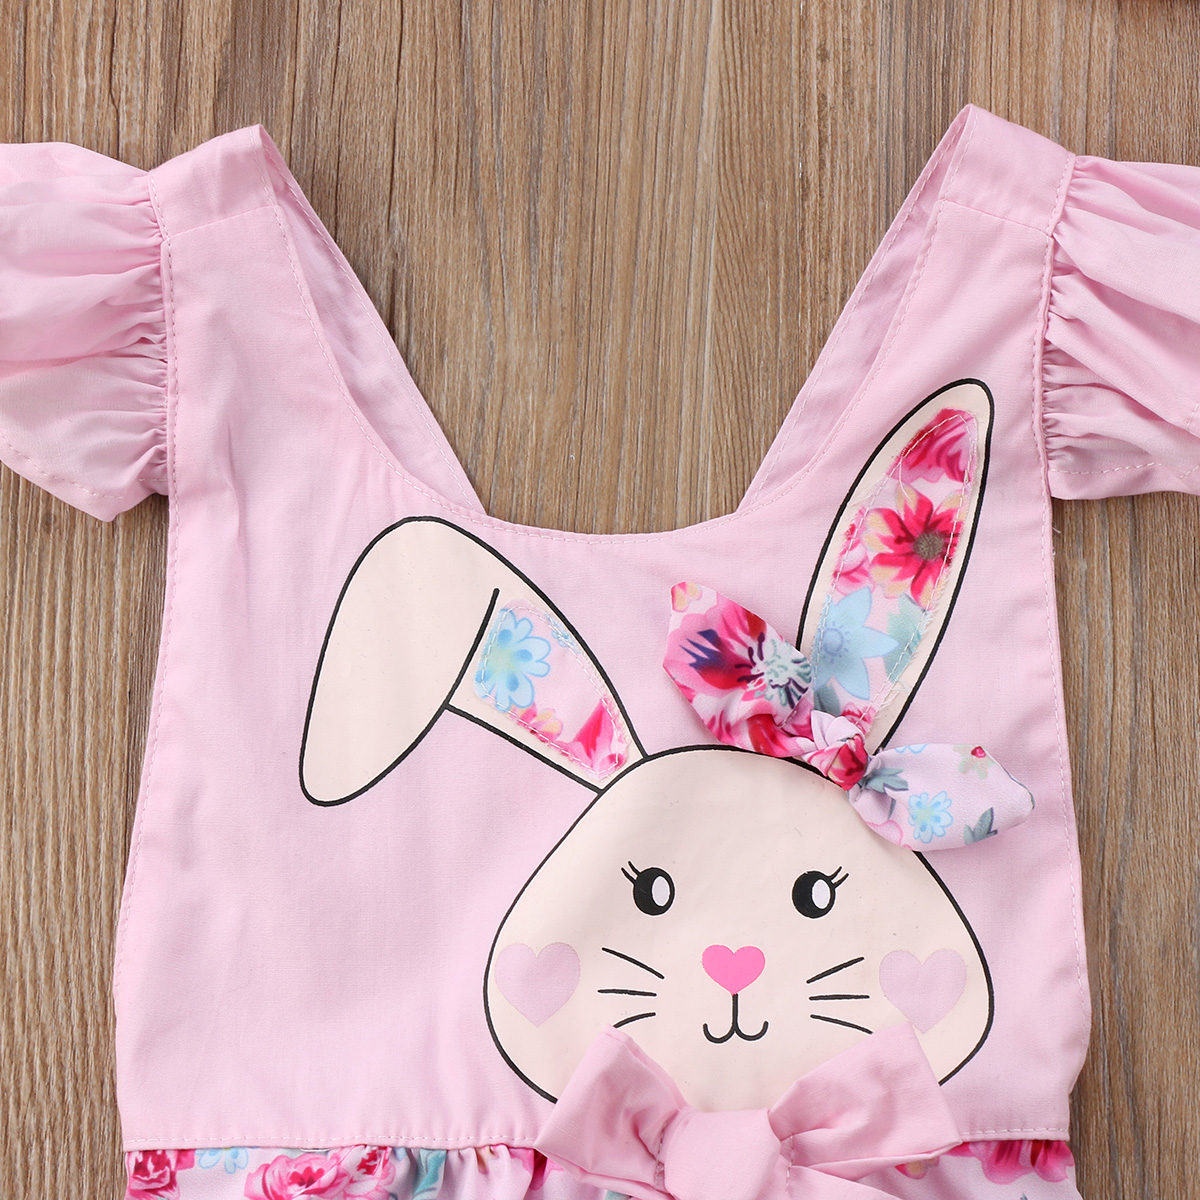 6008dd4e4d63 2018 New Easter Floral Romper Newborn Baby Girl Bunny Romper Flying ...